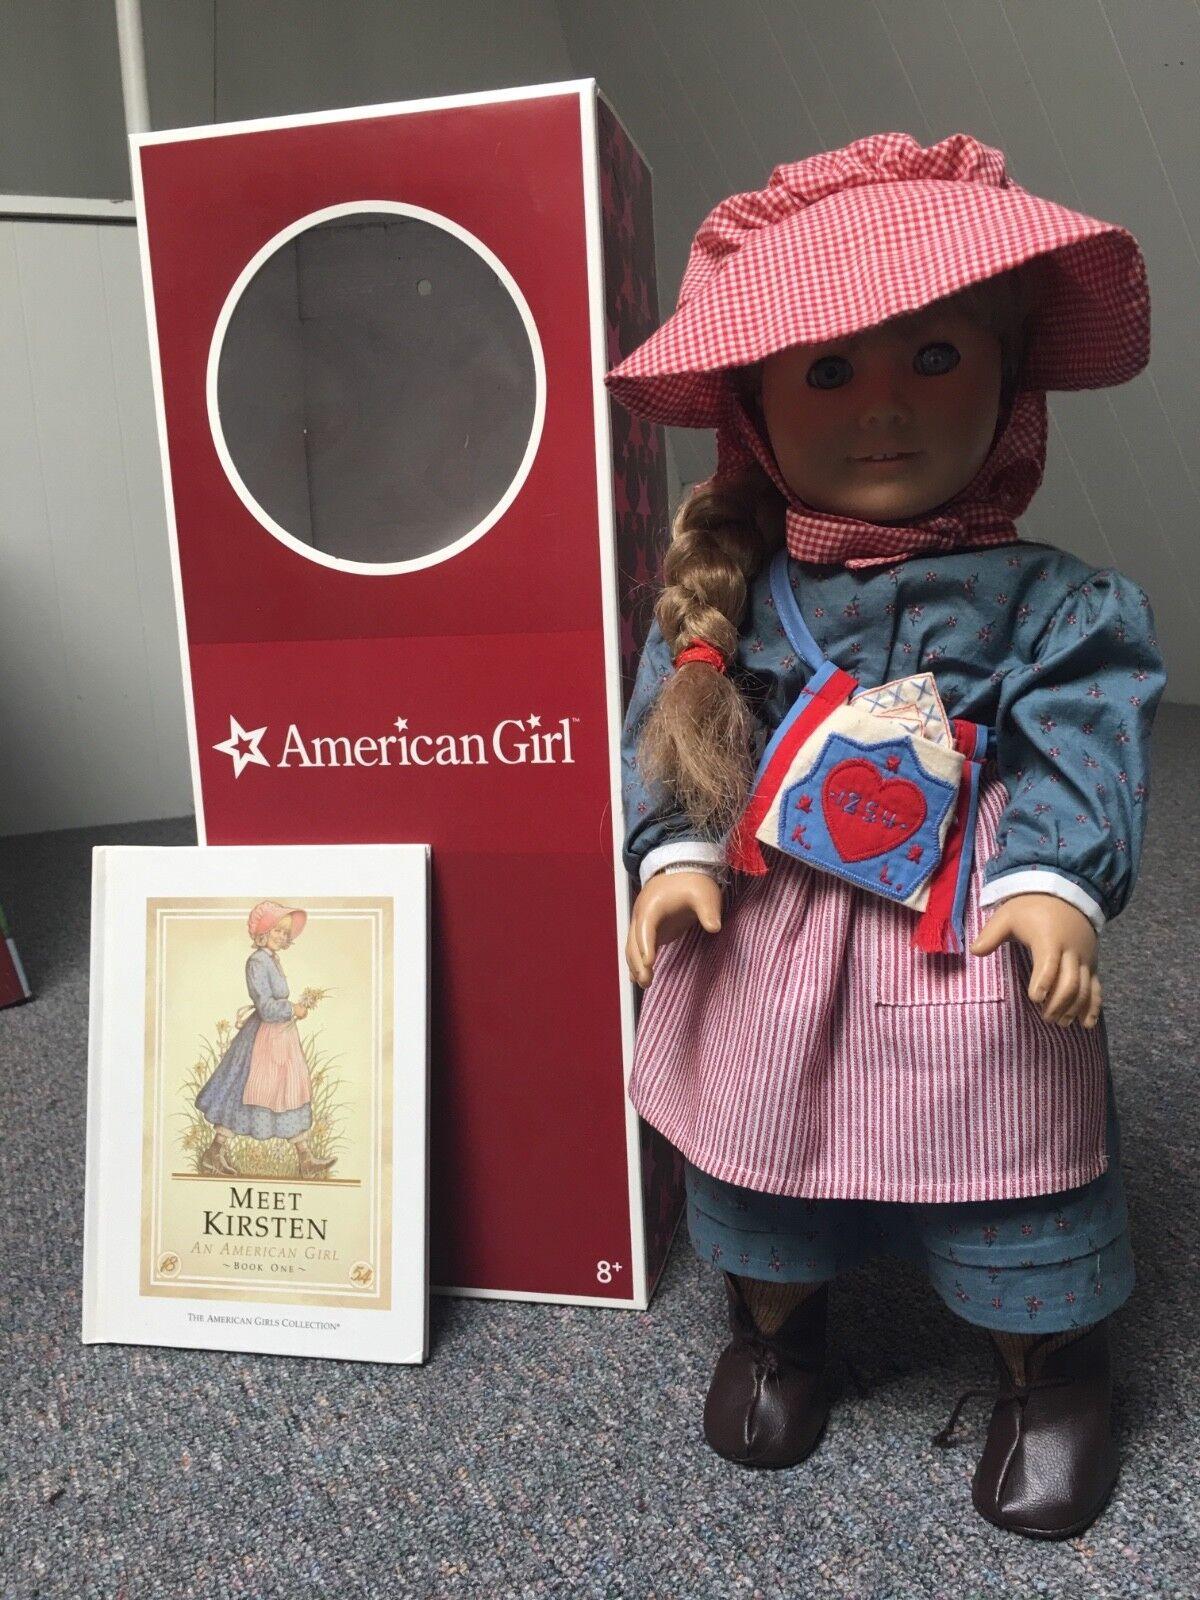 American girl - Kirsten - Good condition